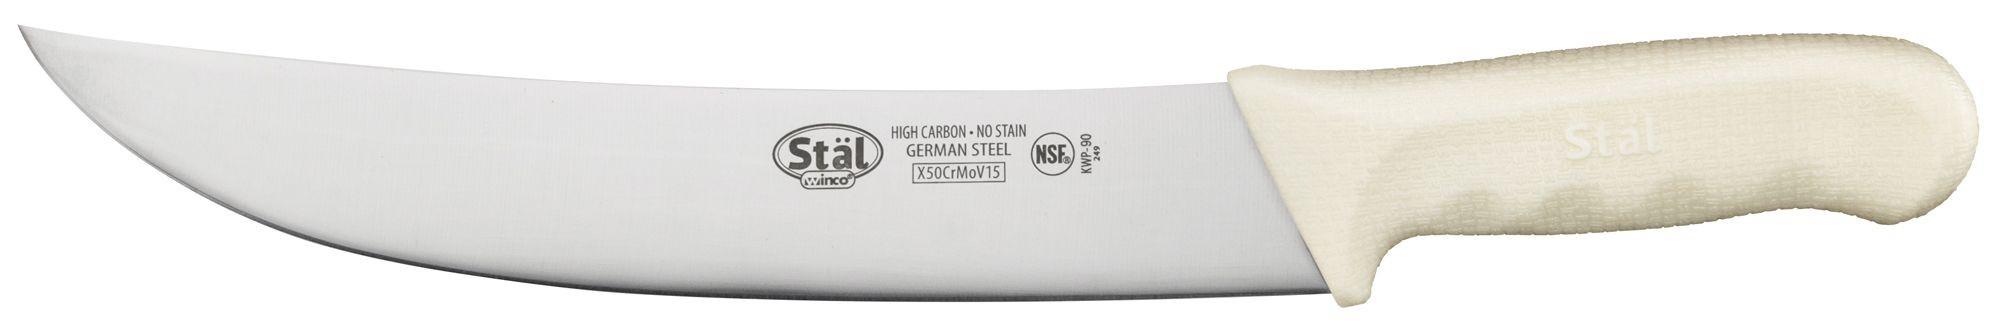 "Winco KWP-90 High Carbon Steel Cimeter Knife 9-1/2"""